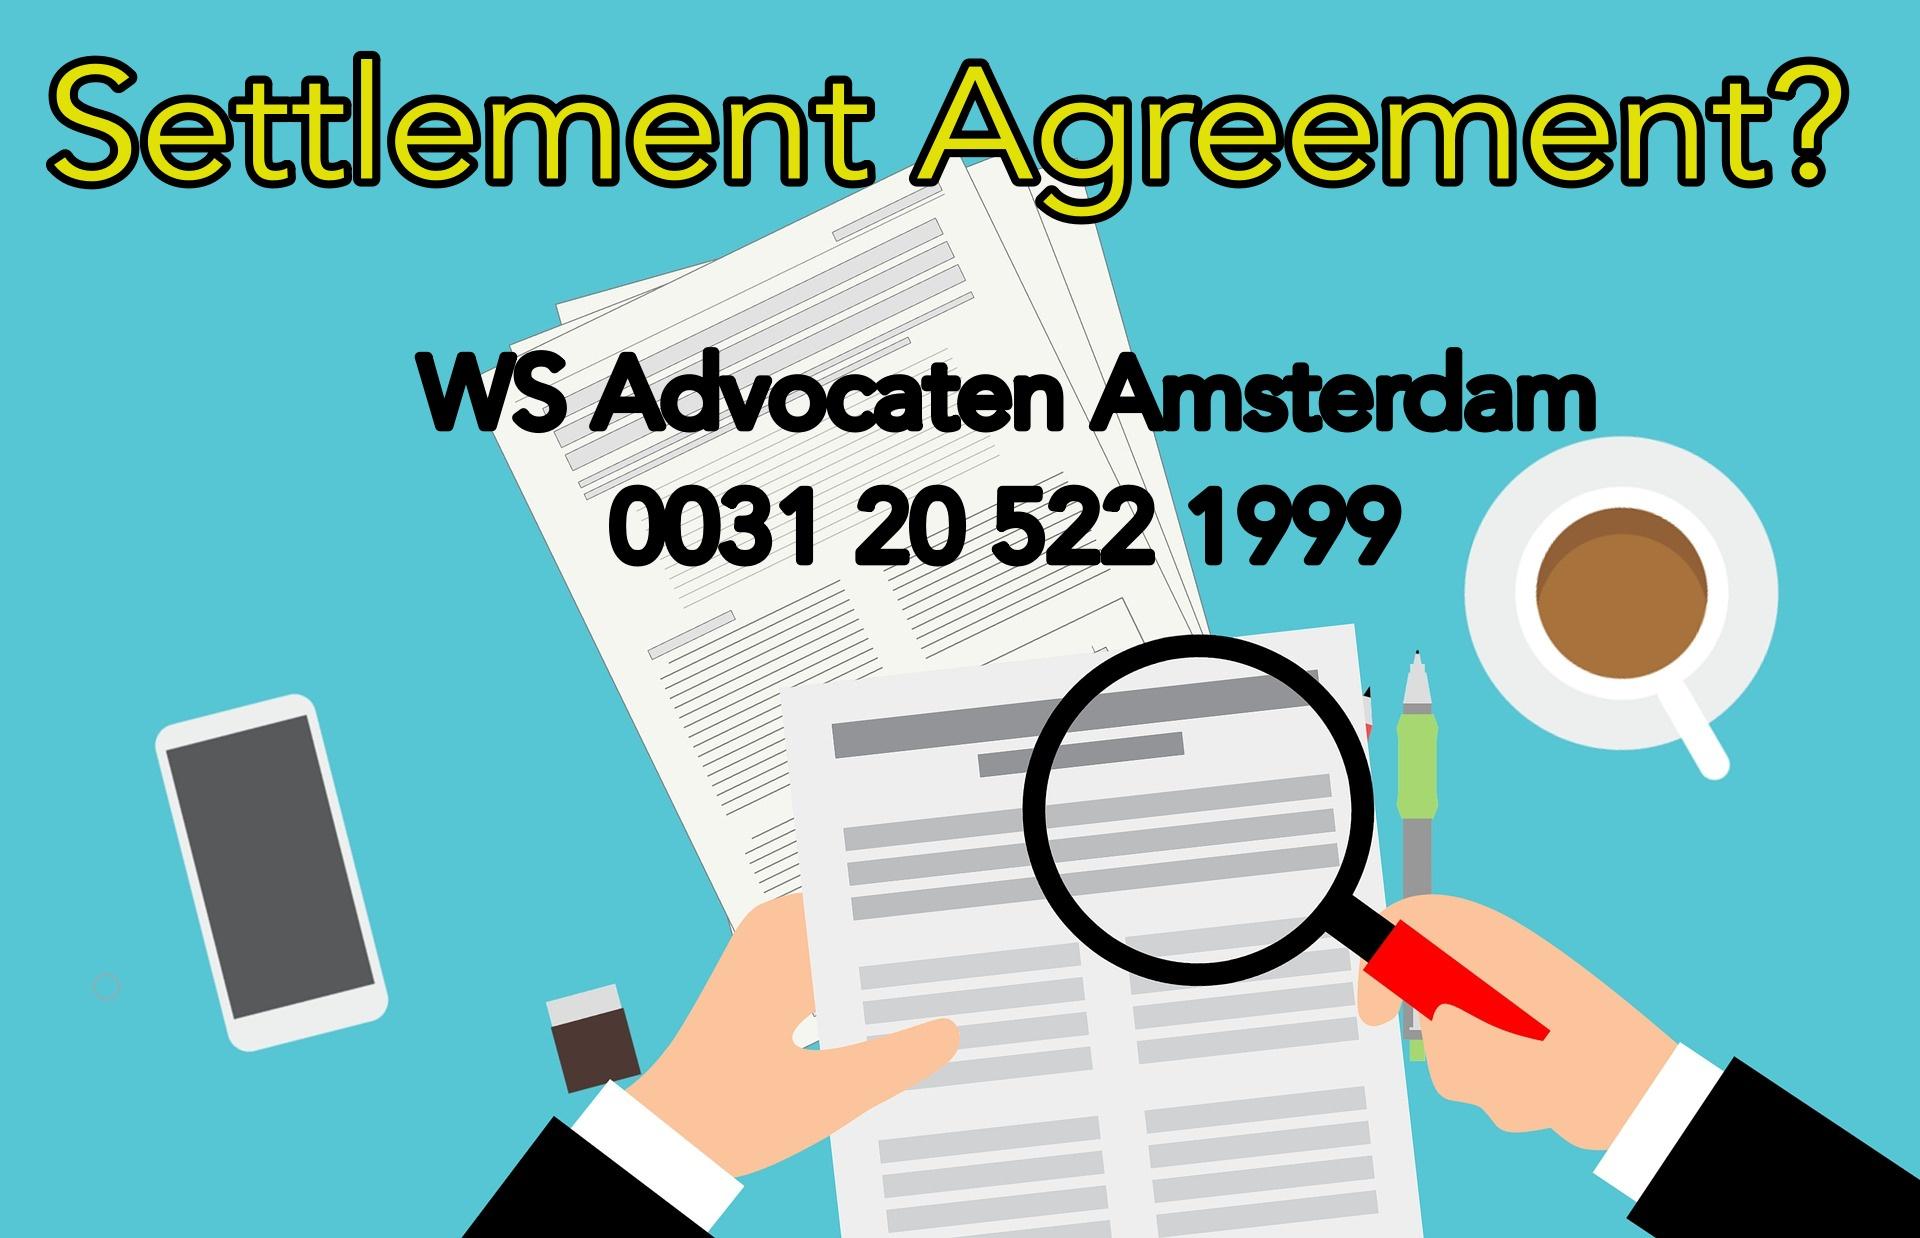 settlement agreement Amsterdam